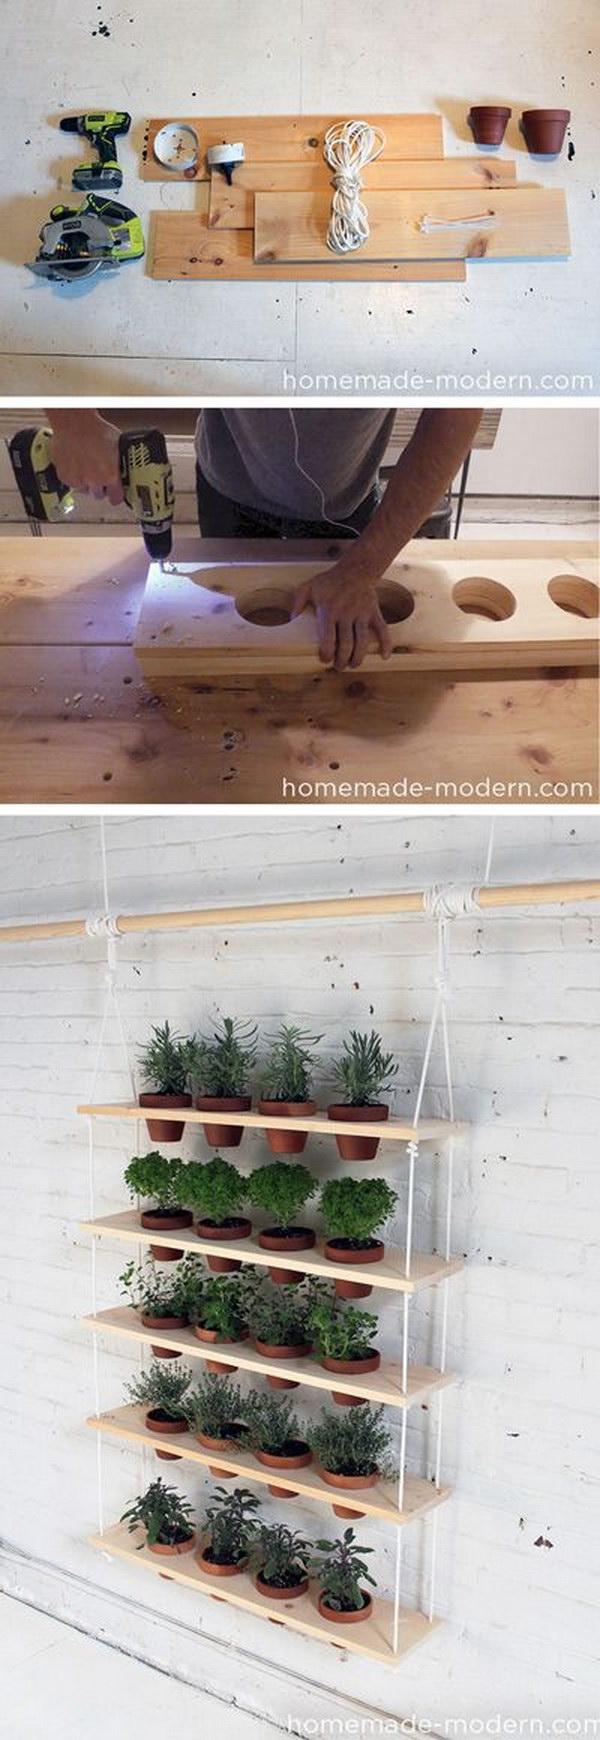 4 DIY Hanging Herb Garden